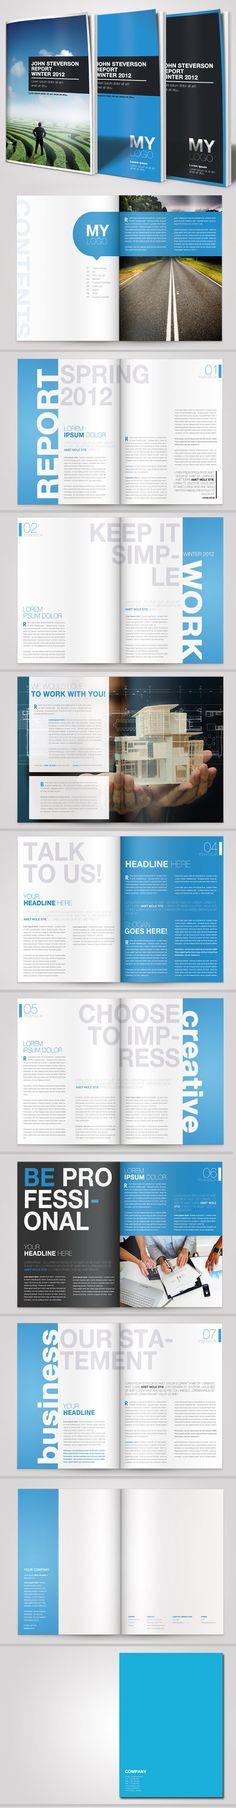 A4 Business Brochure Vol. 03 by Danijel Mokic, via Behance